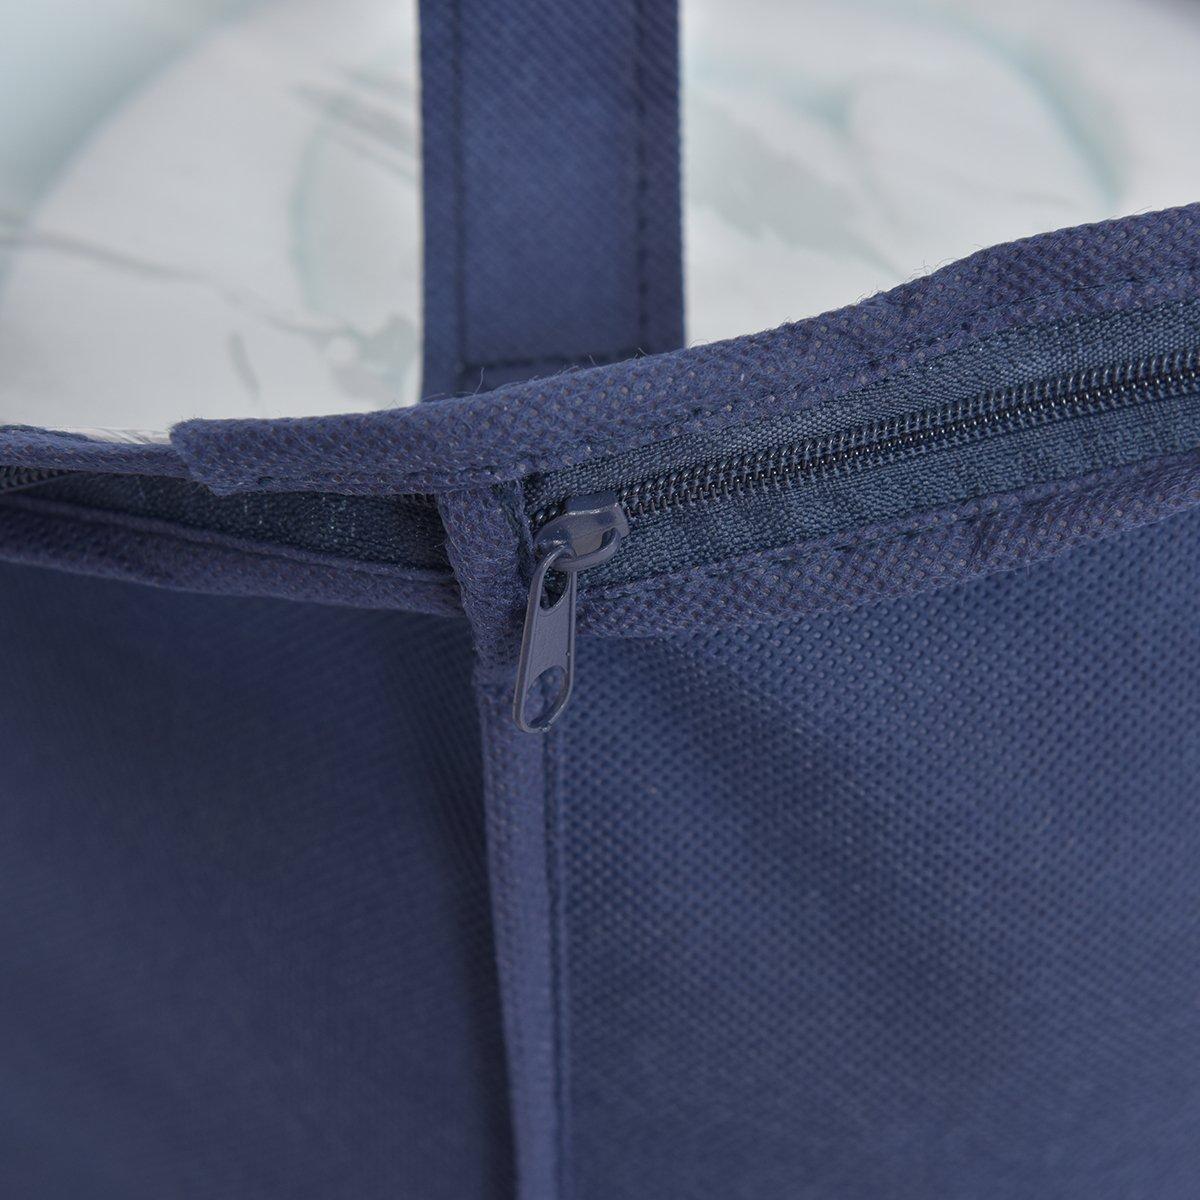 Giantex Bed Rail Bumper Pad Toddler Kids Pet Elderly Semicircle Safety Cushion W/Bag by Giantex